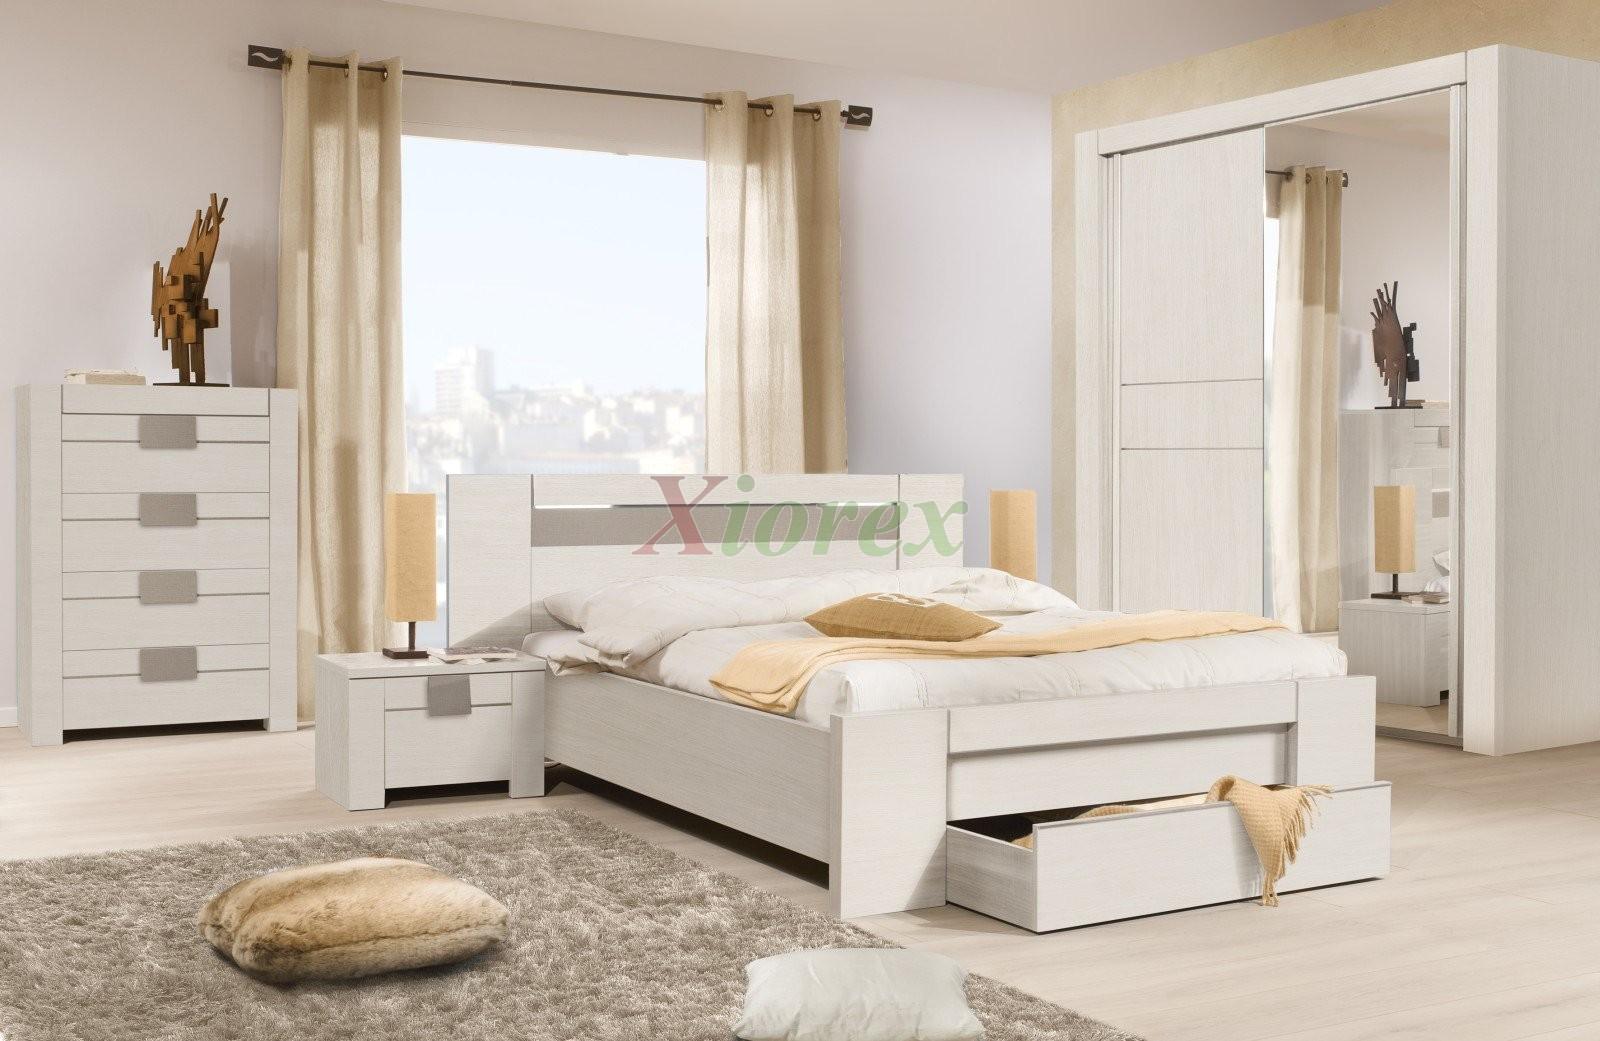 https://www.xiorex.com/media/catalog/product/cache/1/image/ce917ae61abb794fb66945dcc312e713/g/a/gami_moka_master_bedroom_set_in_white_ash_xiorex.jpg